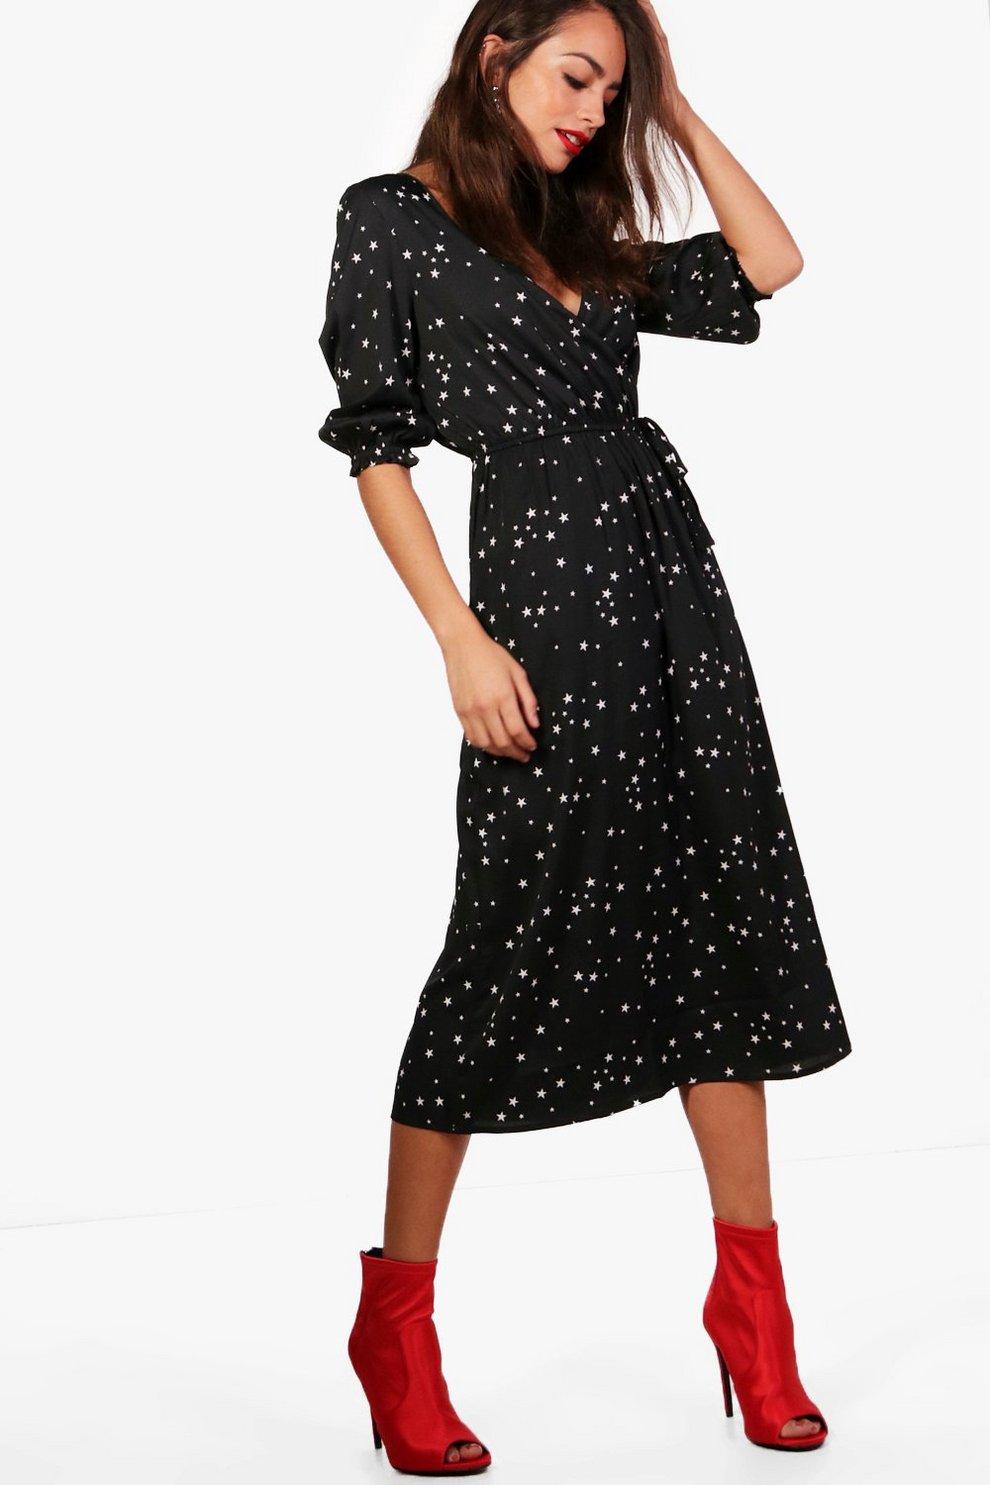 361bb0e10895 Becci Star Print Wrap Midi Skater Dress | Boohoo